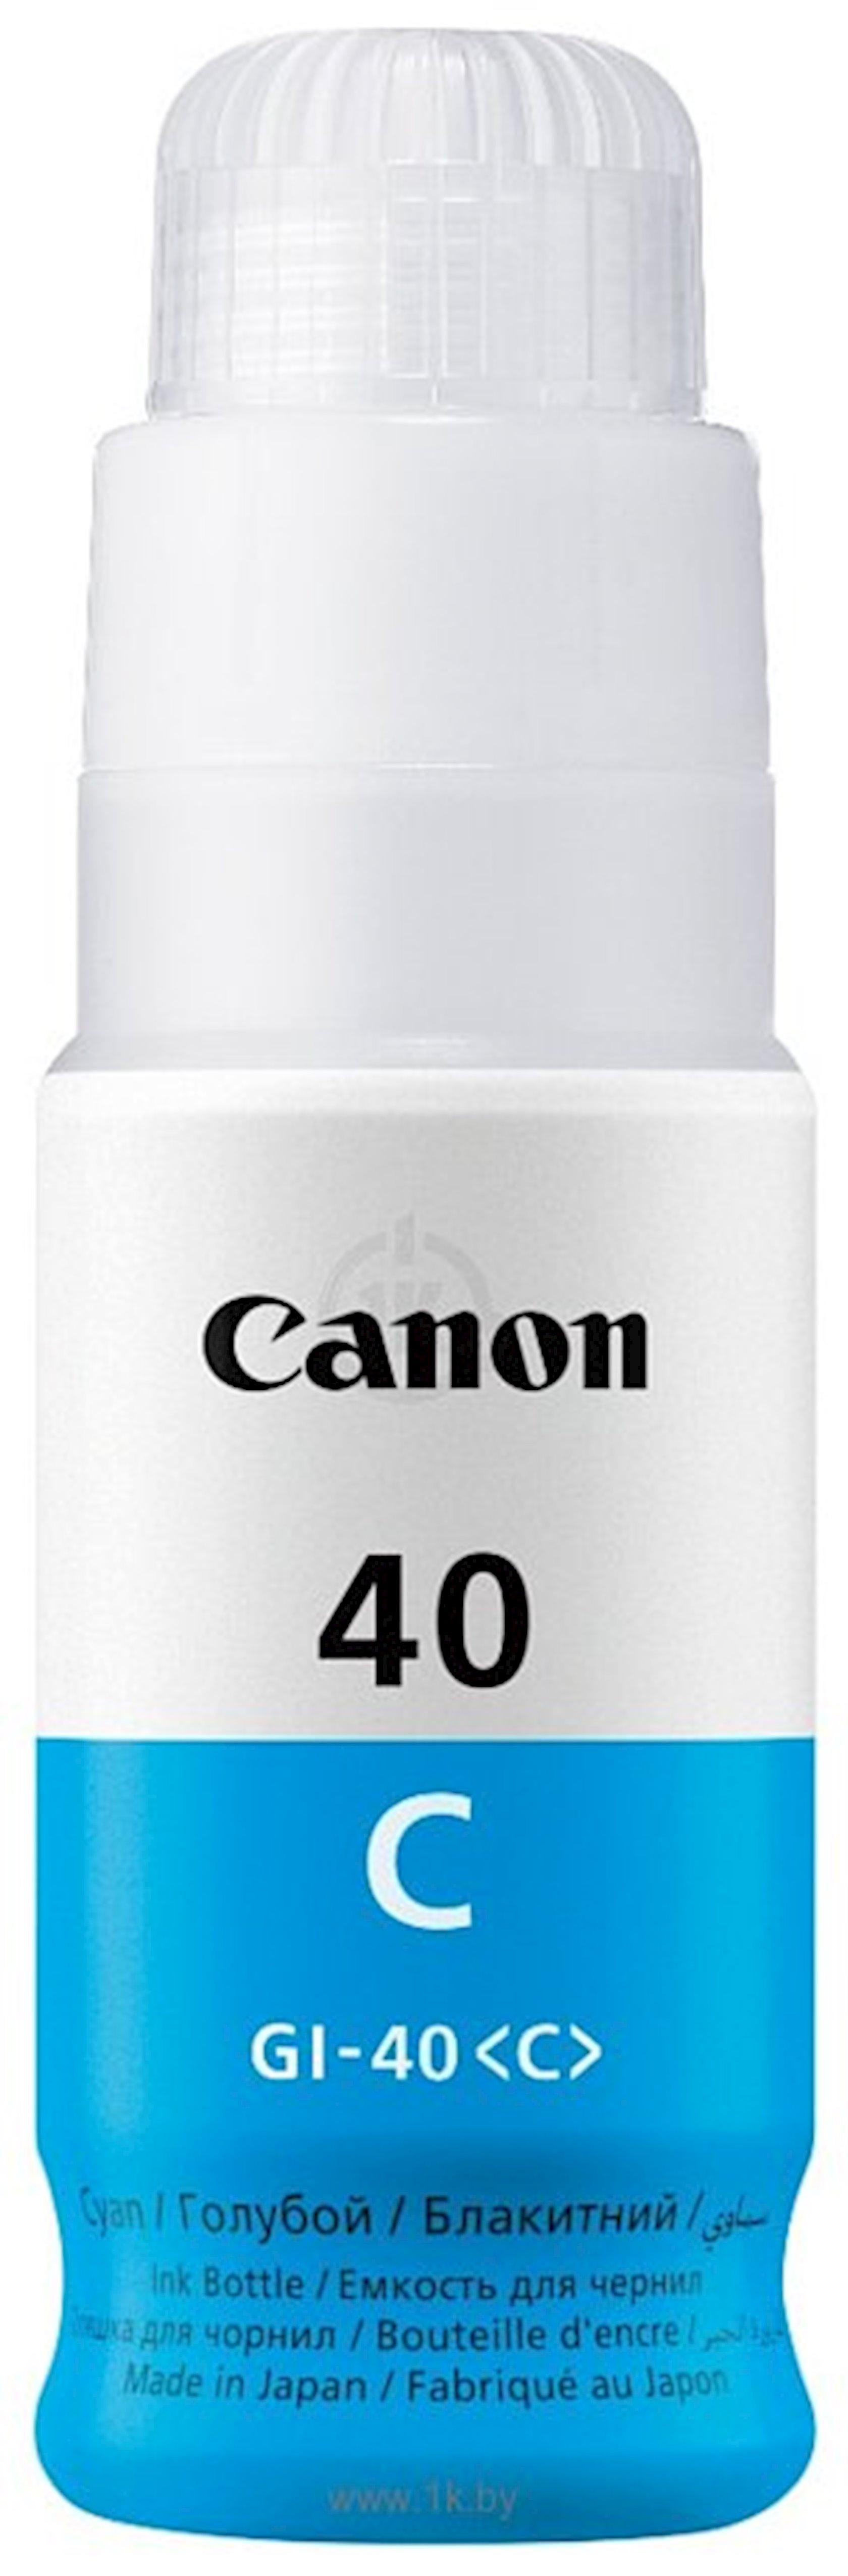 Toner-kartric Canon INK GI-40 C